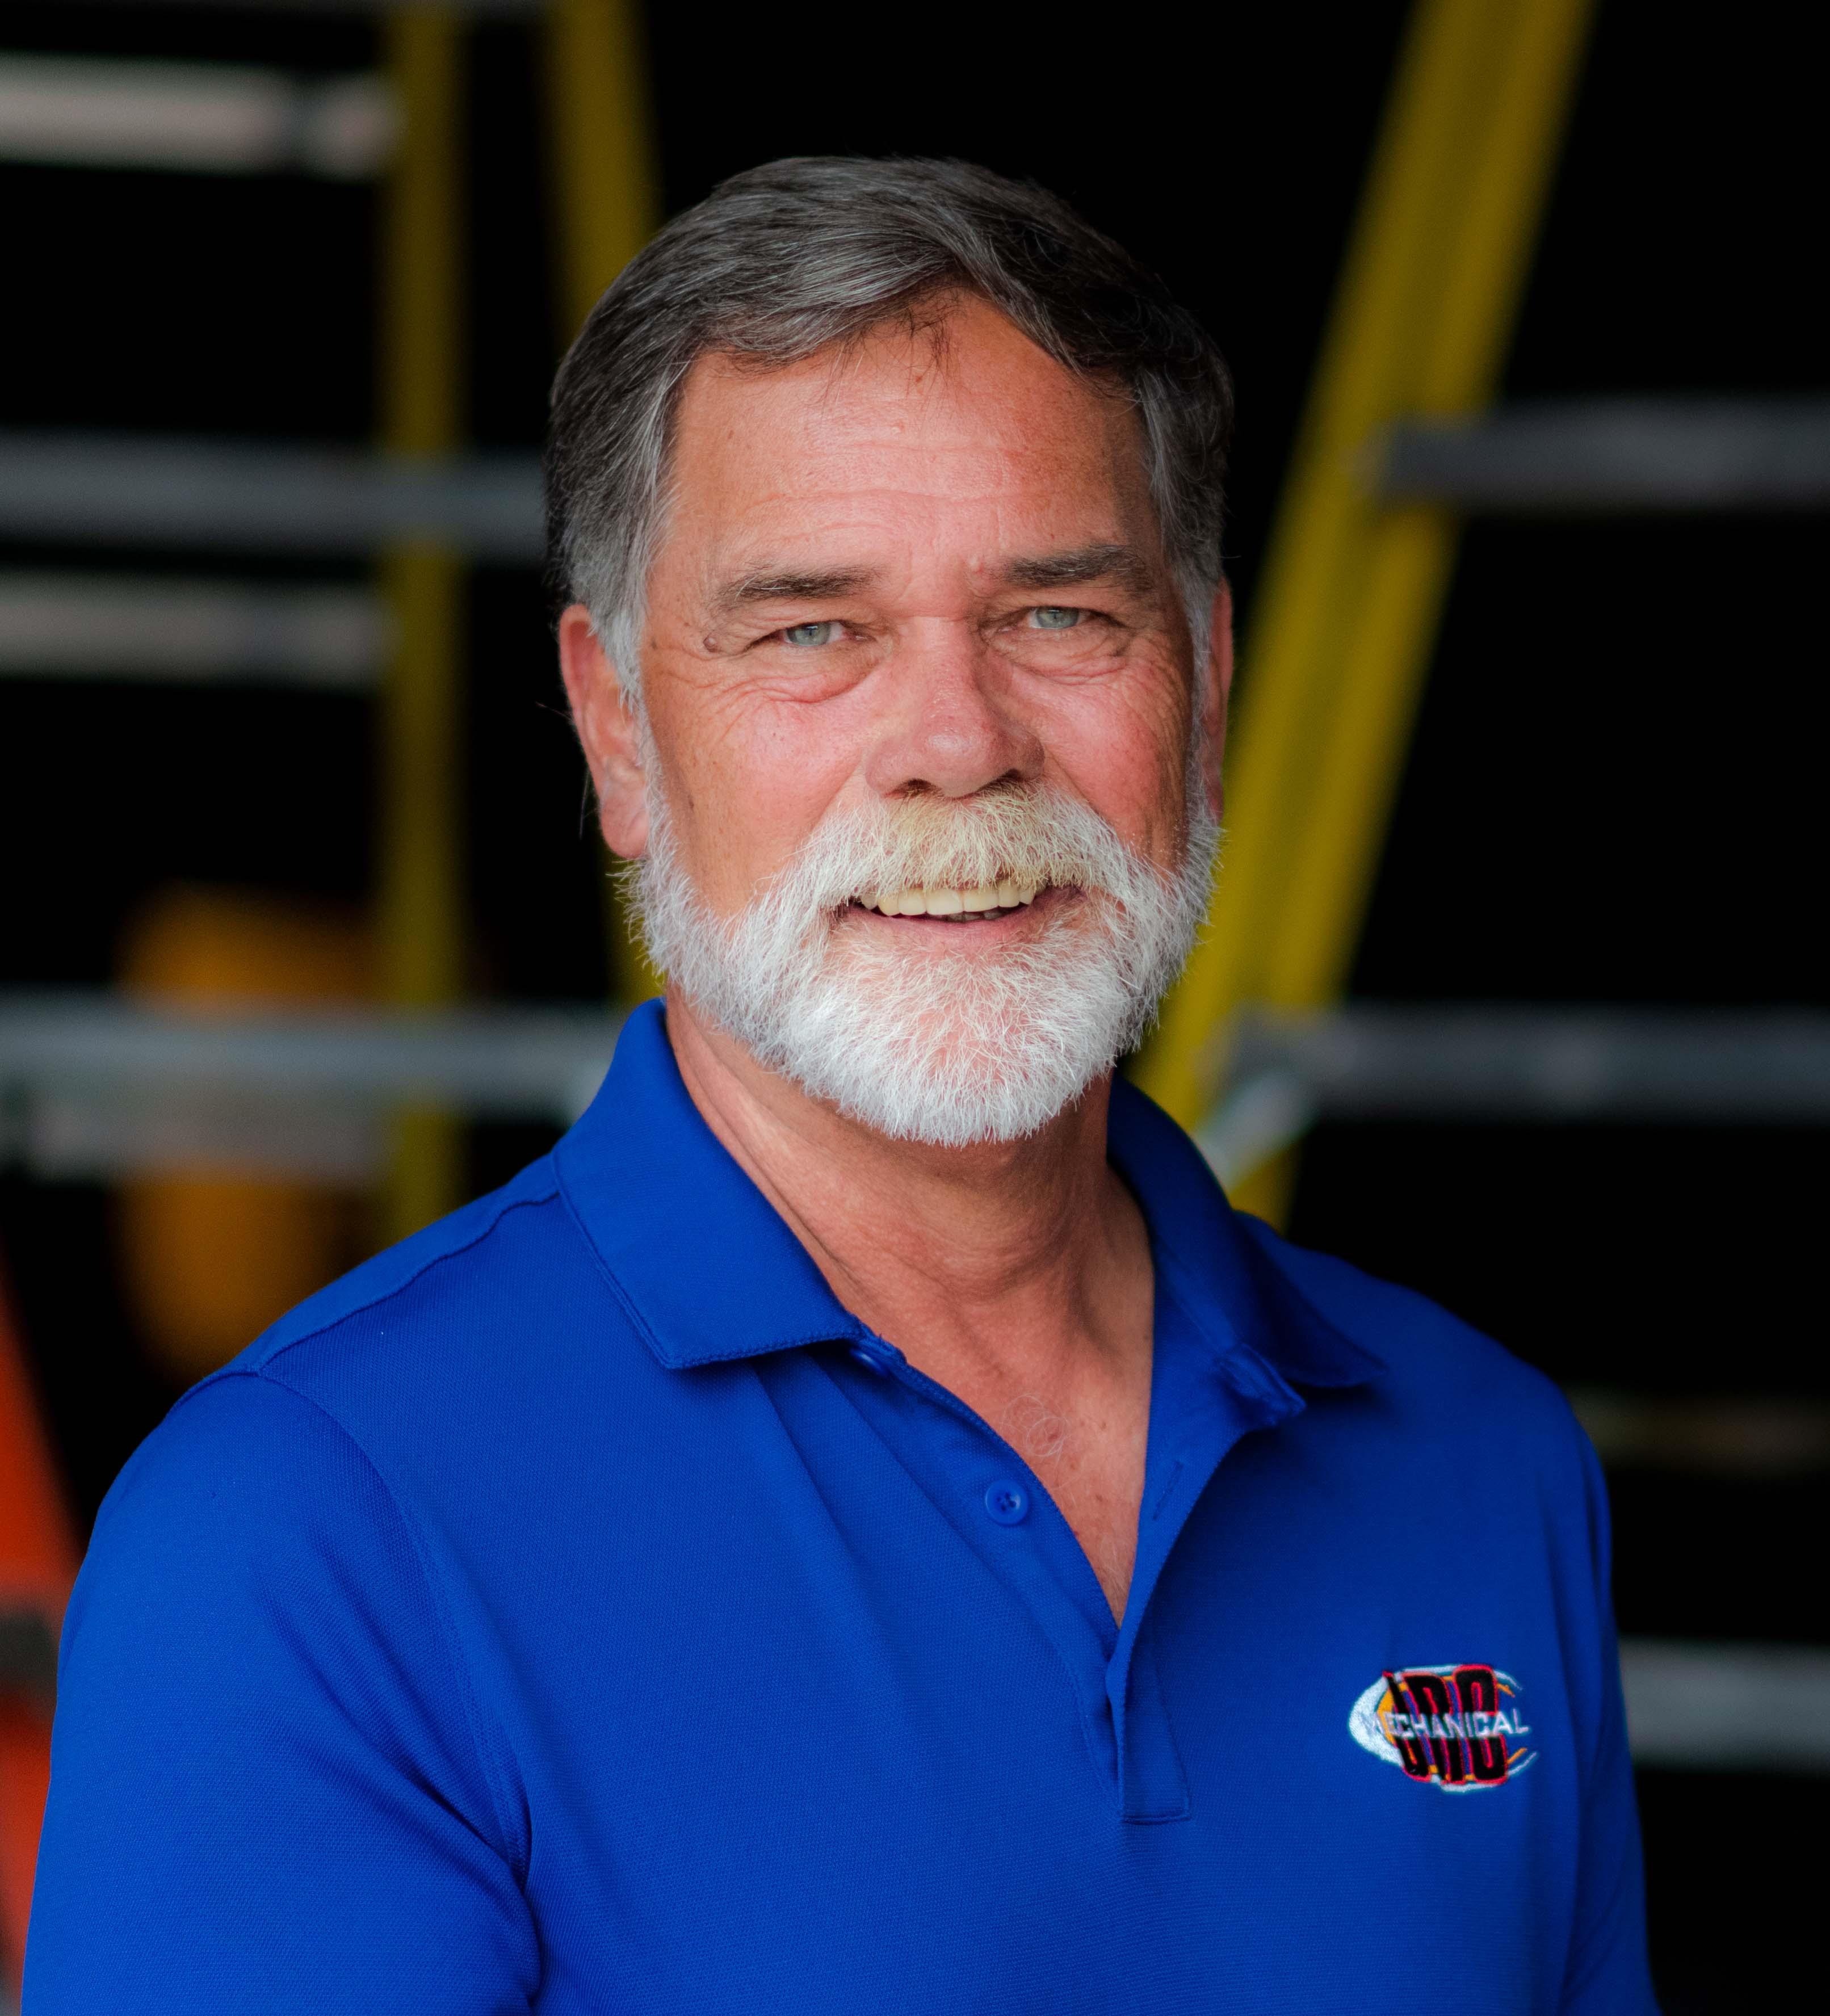 Ron Salamon Vice President of Operations